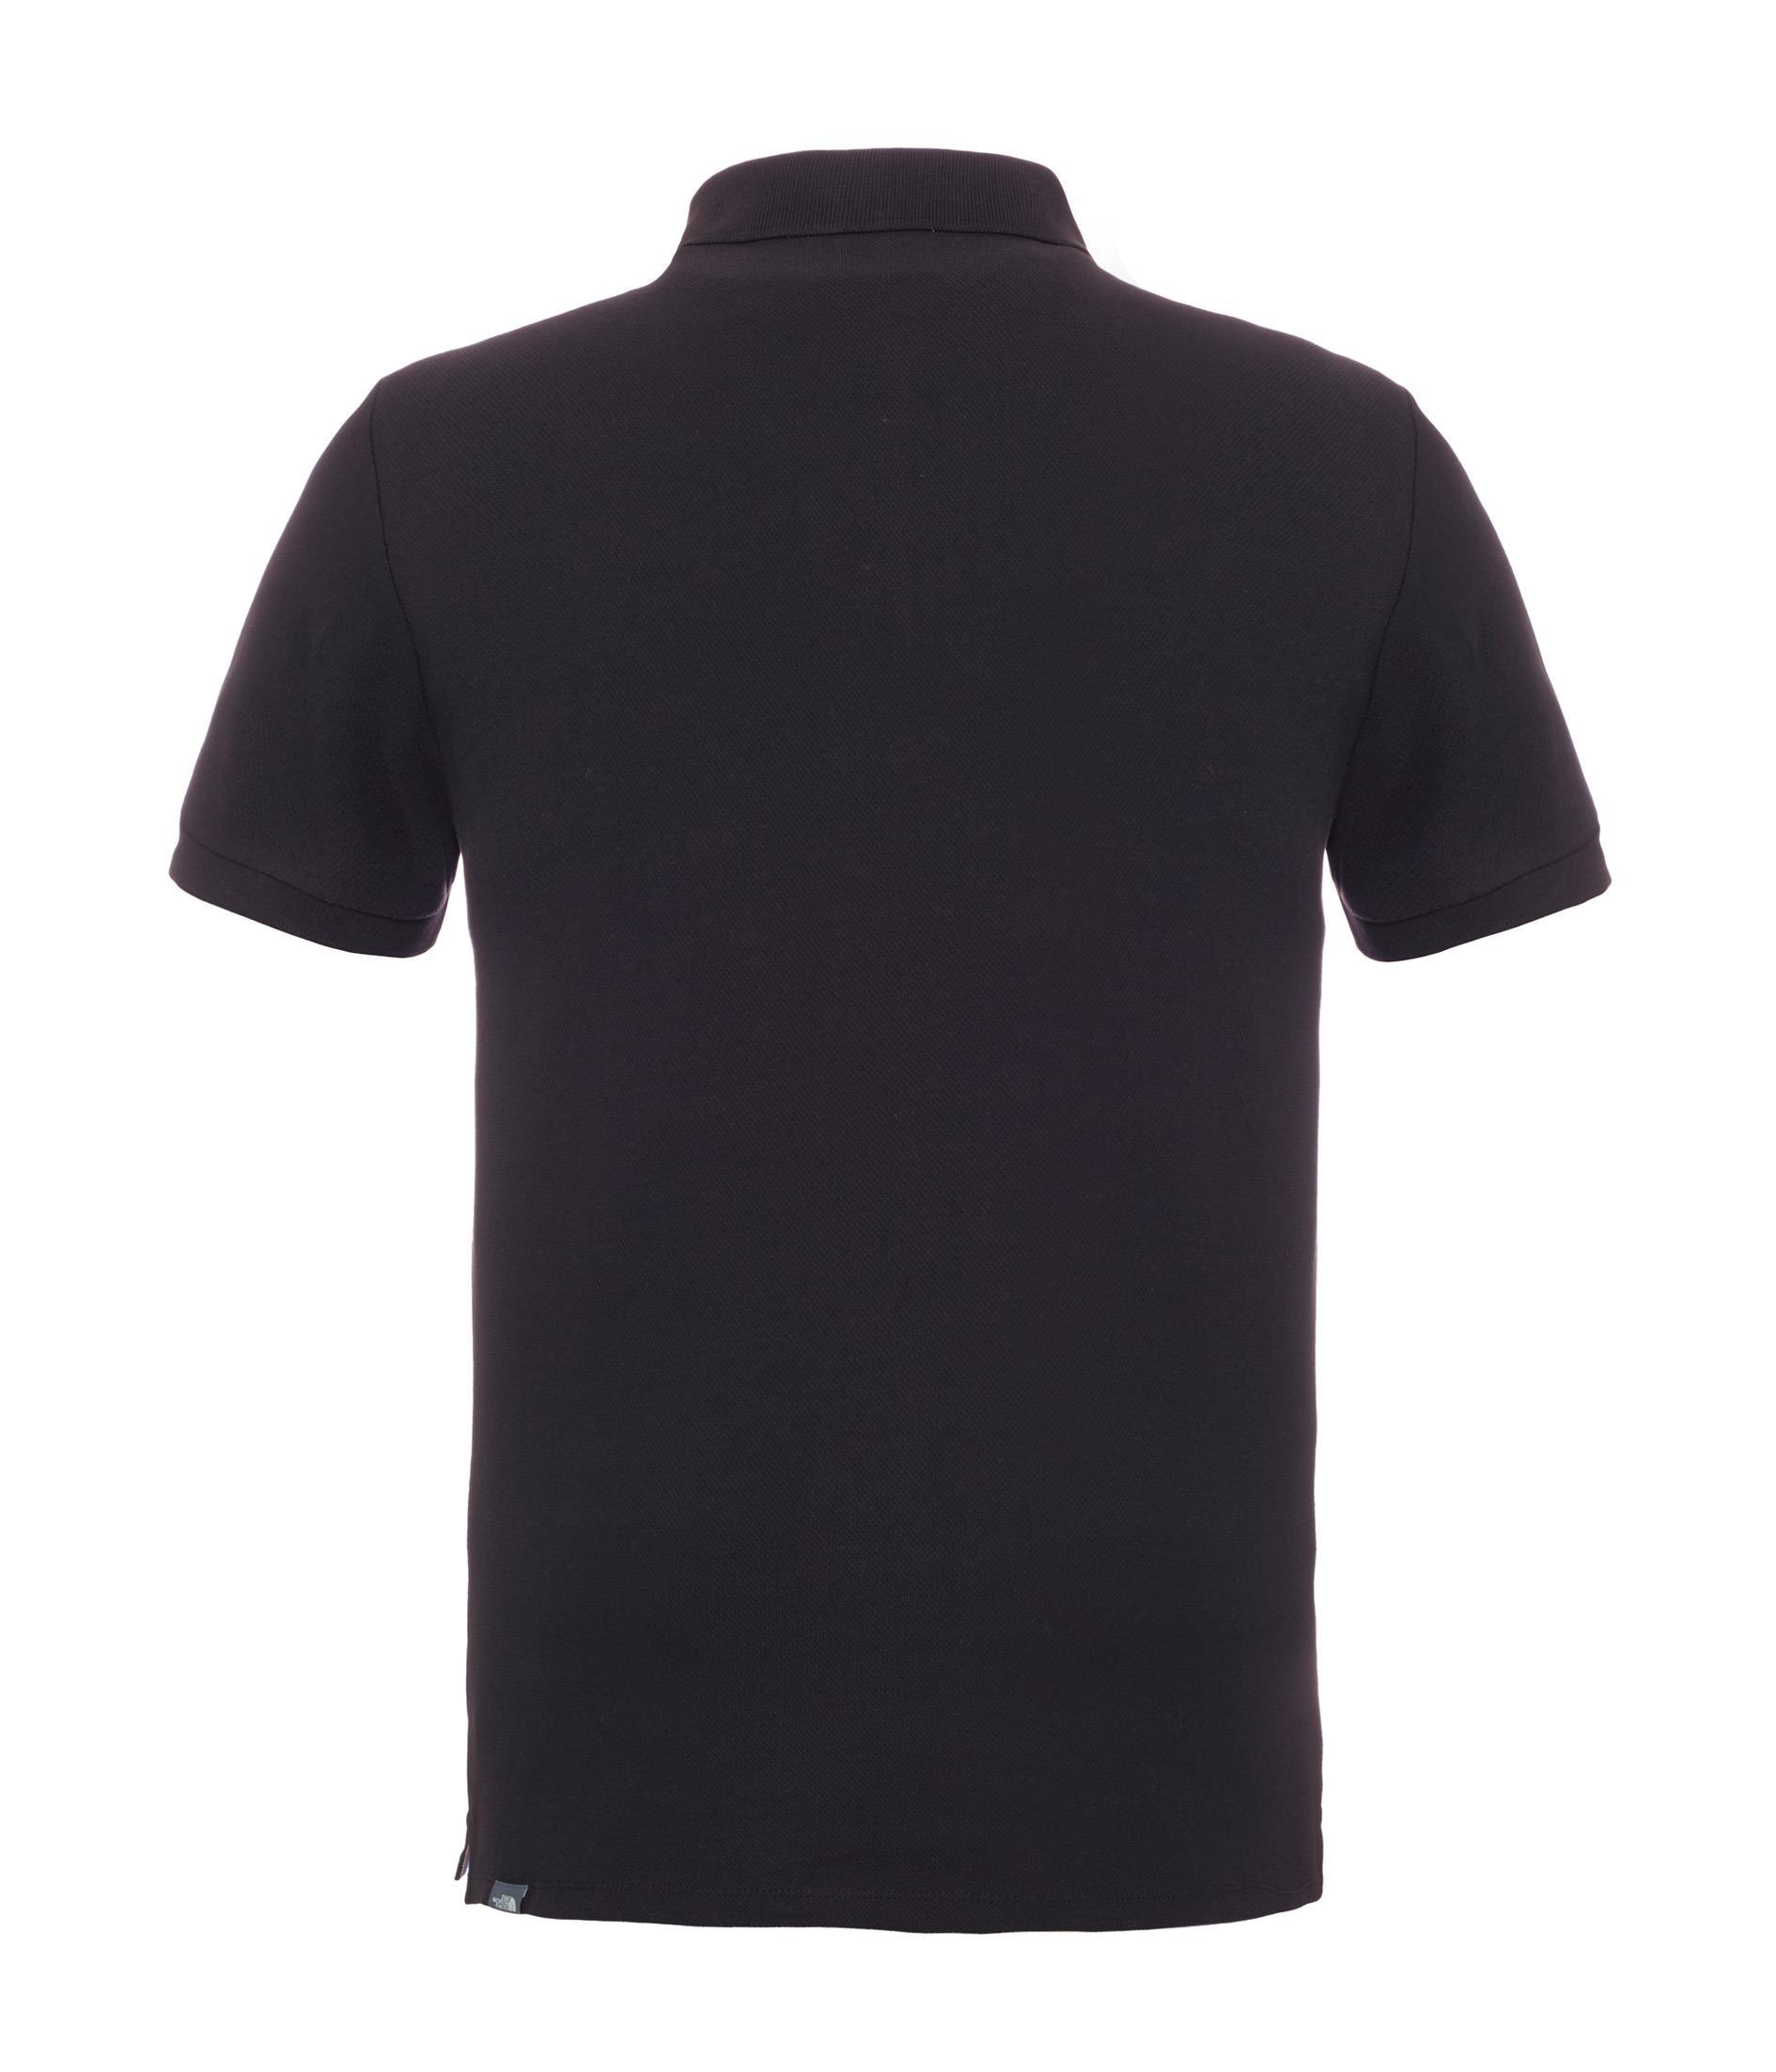 The Northface Erkek Premium Polo Pique Tişört T0Cev4Kx7